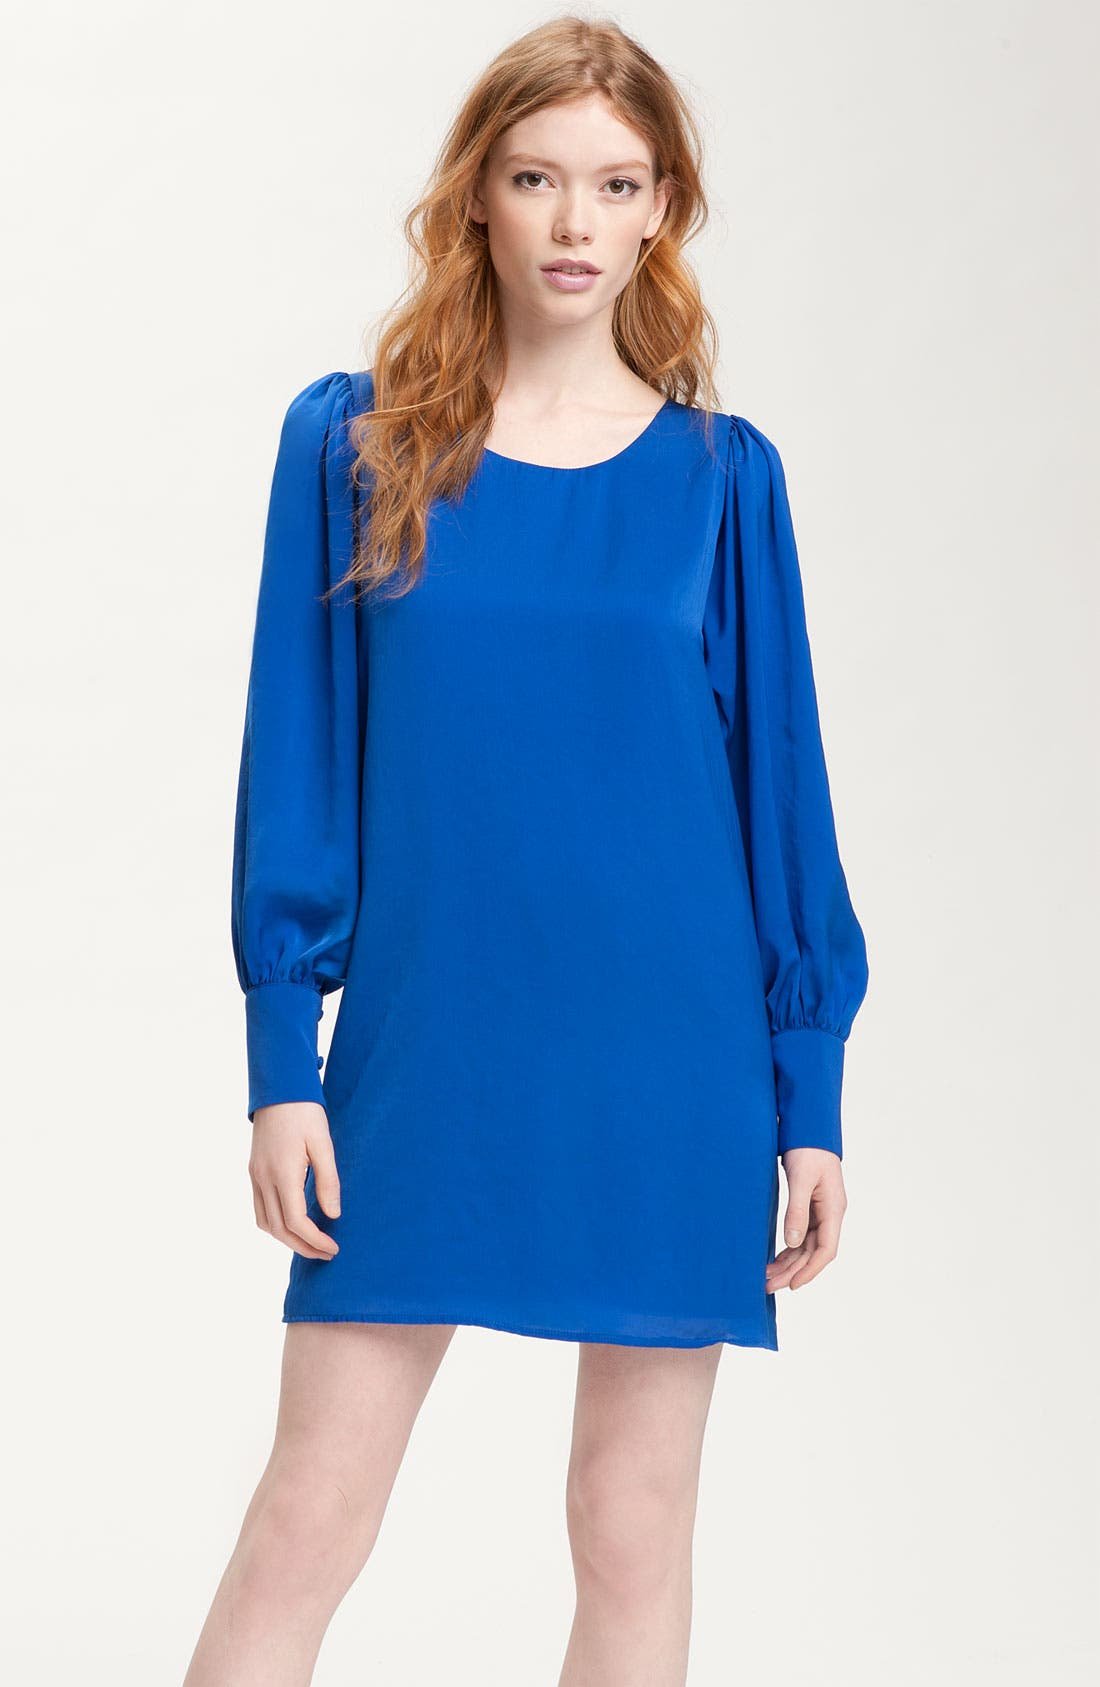 Alternate Image 1 Selected - Rory Beca 'Juliette' Gathered Sleeve Shift Dress